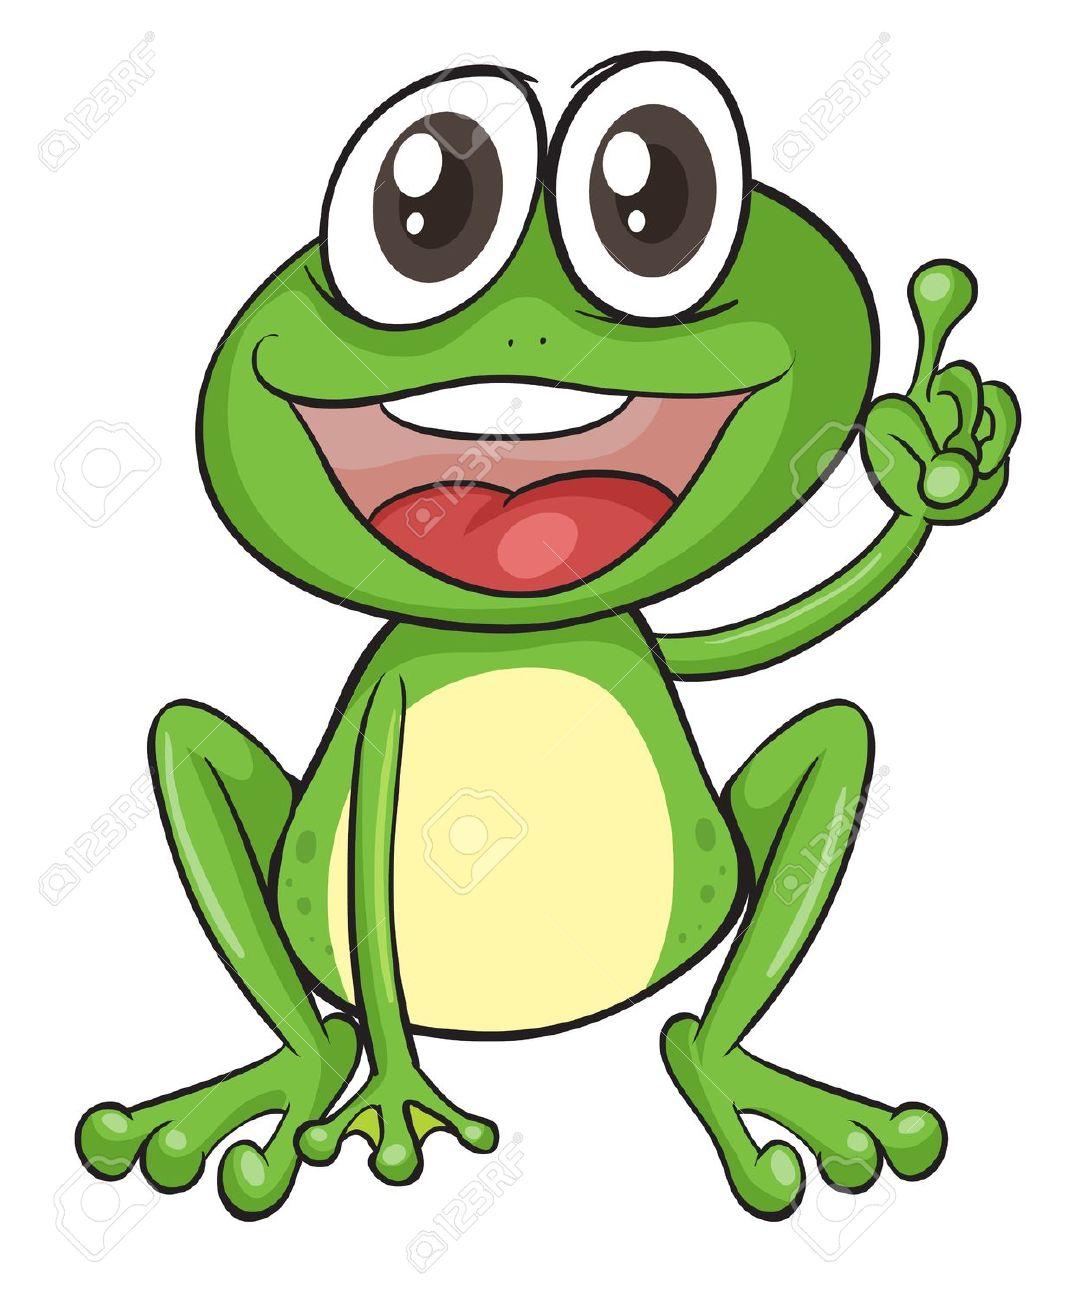 Free frog clip art drawings .-Free frog clip art drawings .-16